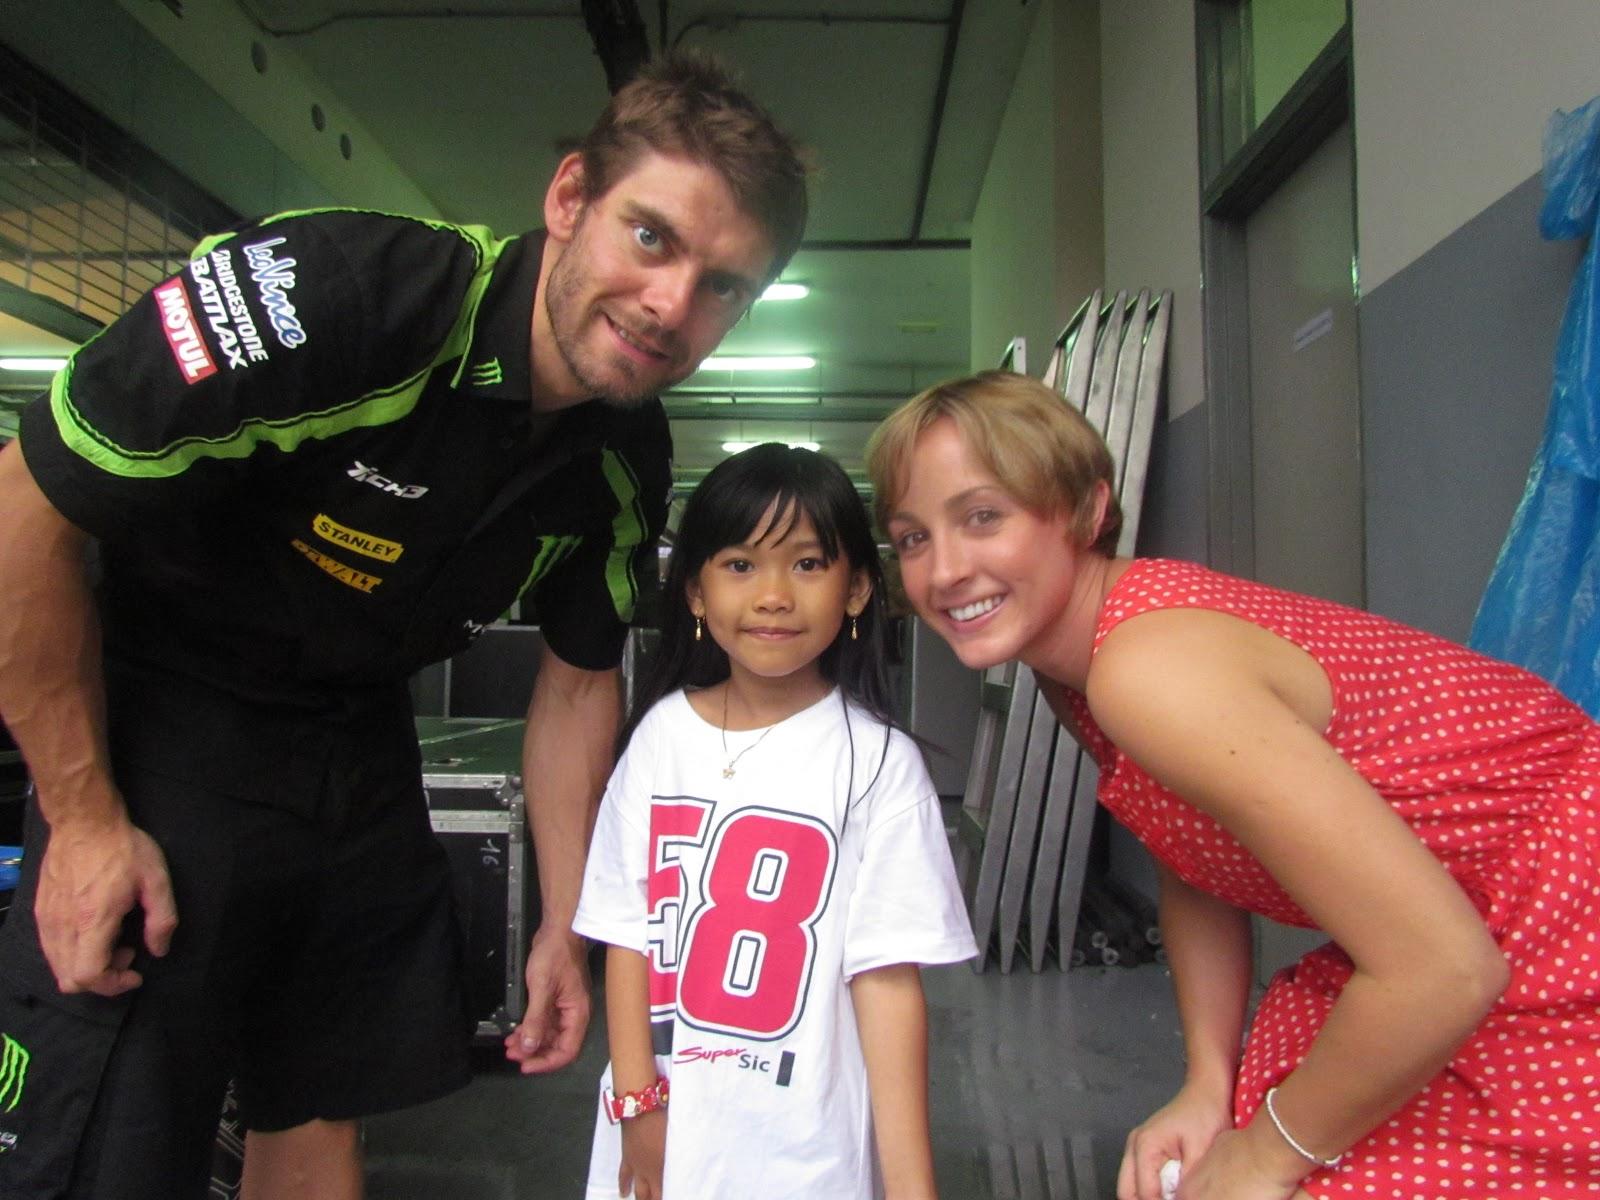 dsulistiyo love VR46: Cal Crutchlow , Lucy and Shaina MotoGP 2012